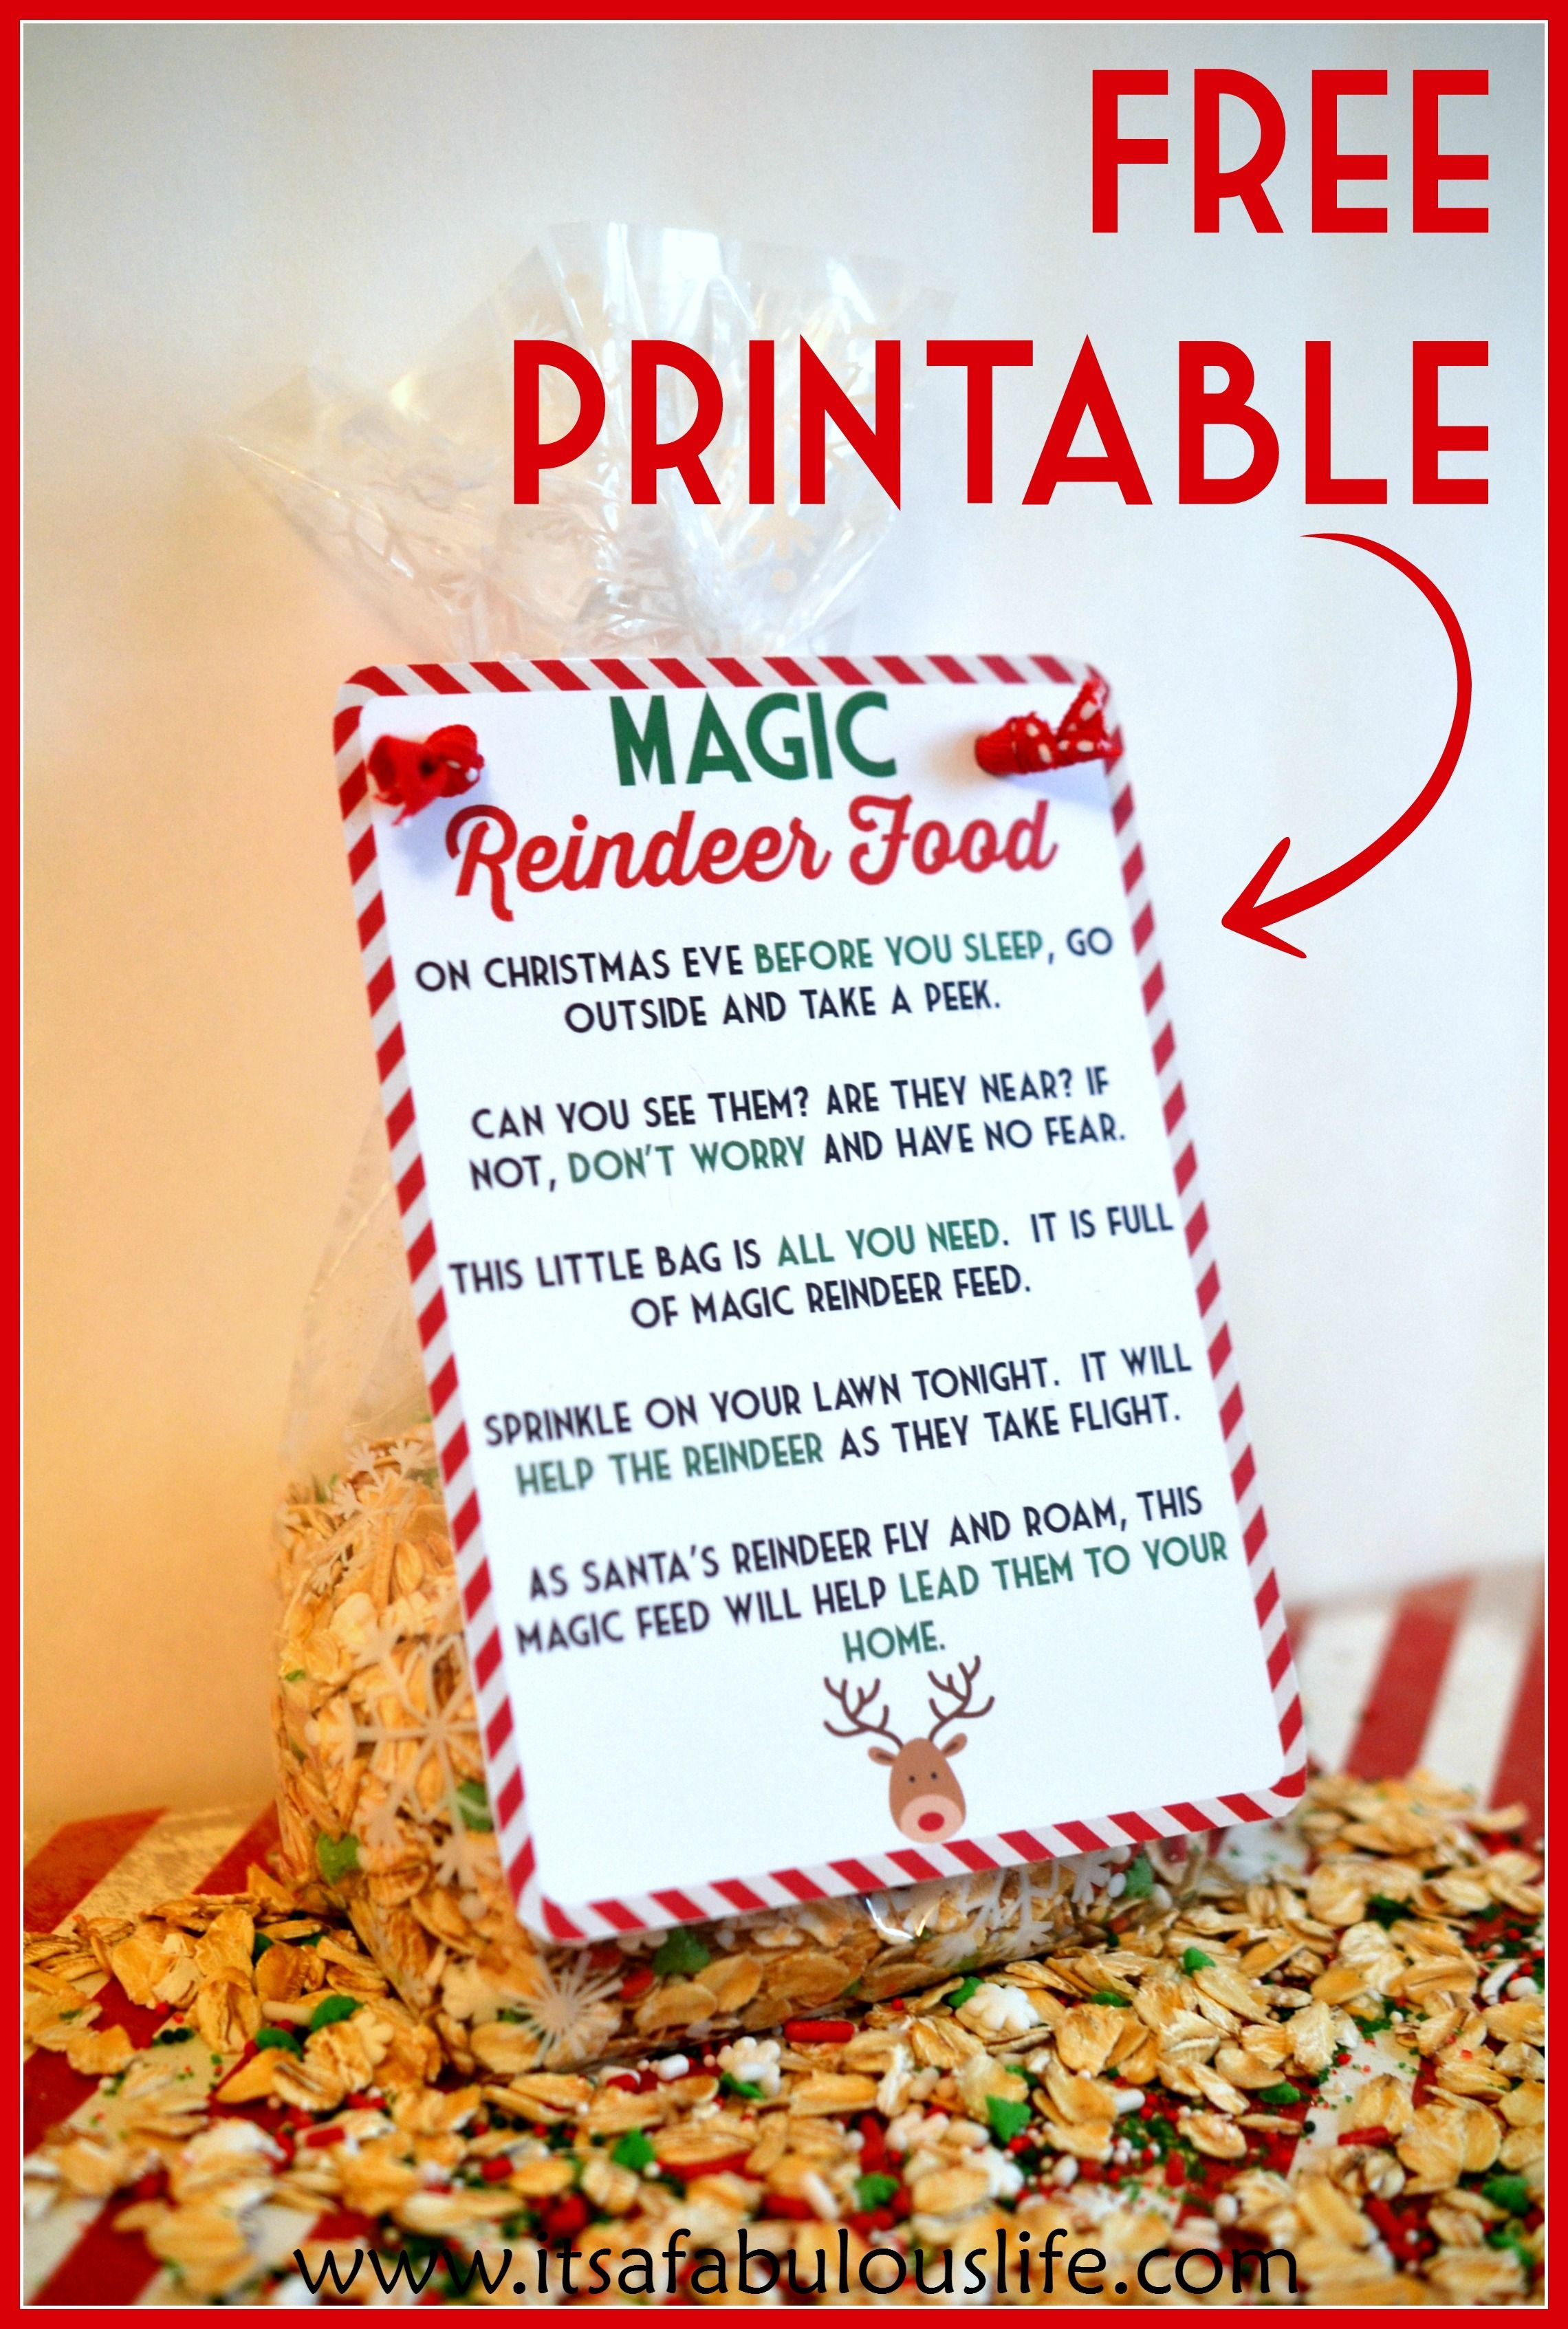 Magic Reindeer Food Poem & Free Printable | Little People, Big - Reindeer Food Poem Free Printable